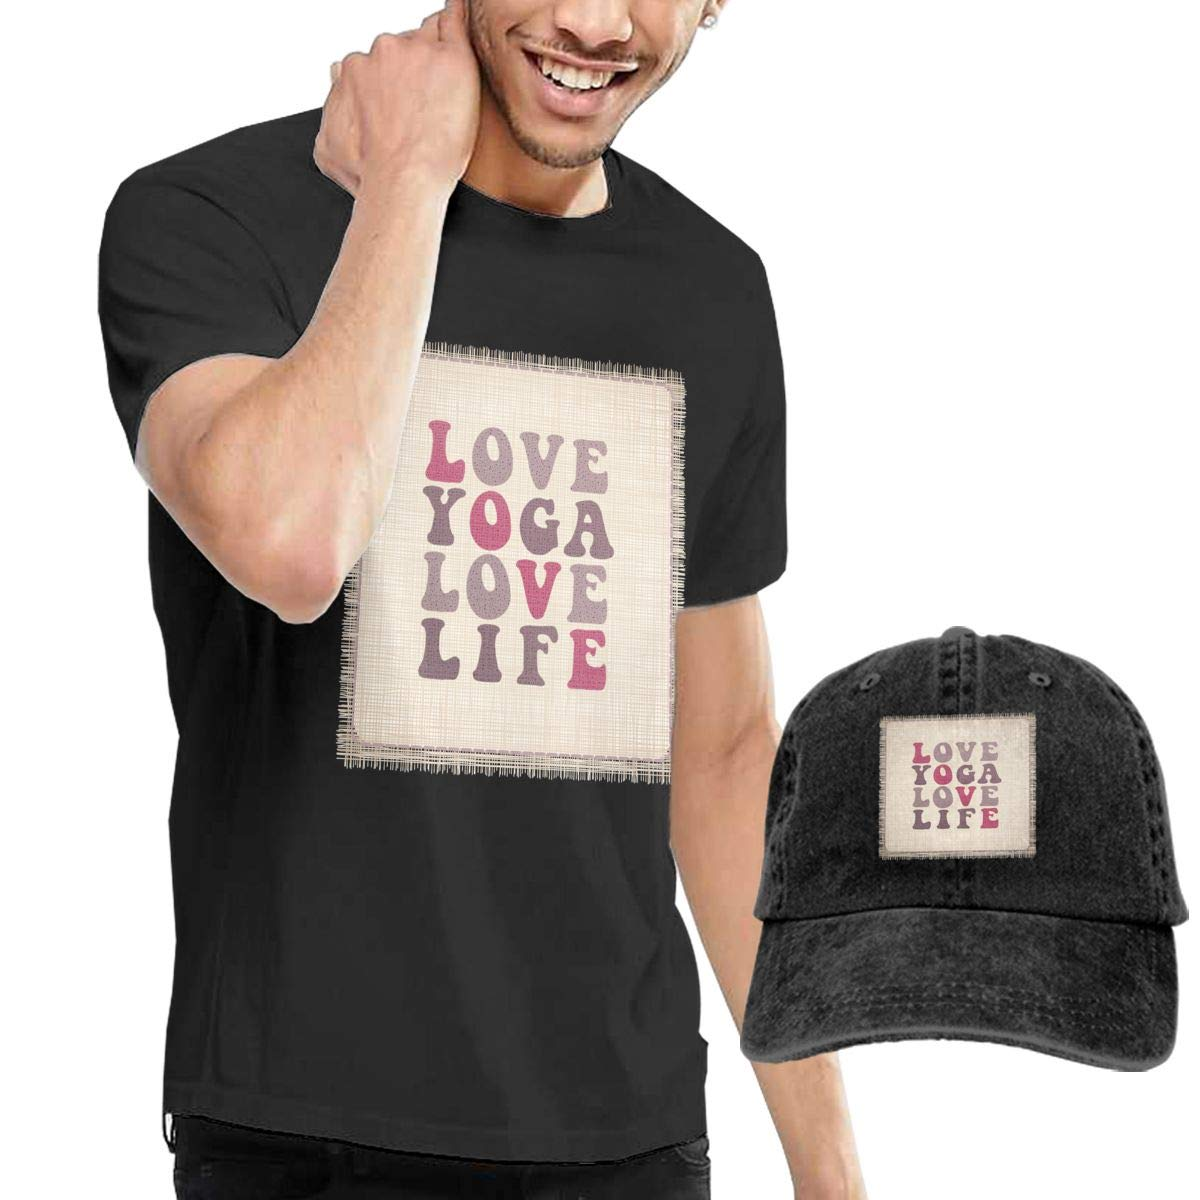 Mens Short Sleeves Yoga Life T-Shirt + Jeans Hats Combo Set ...